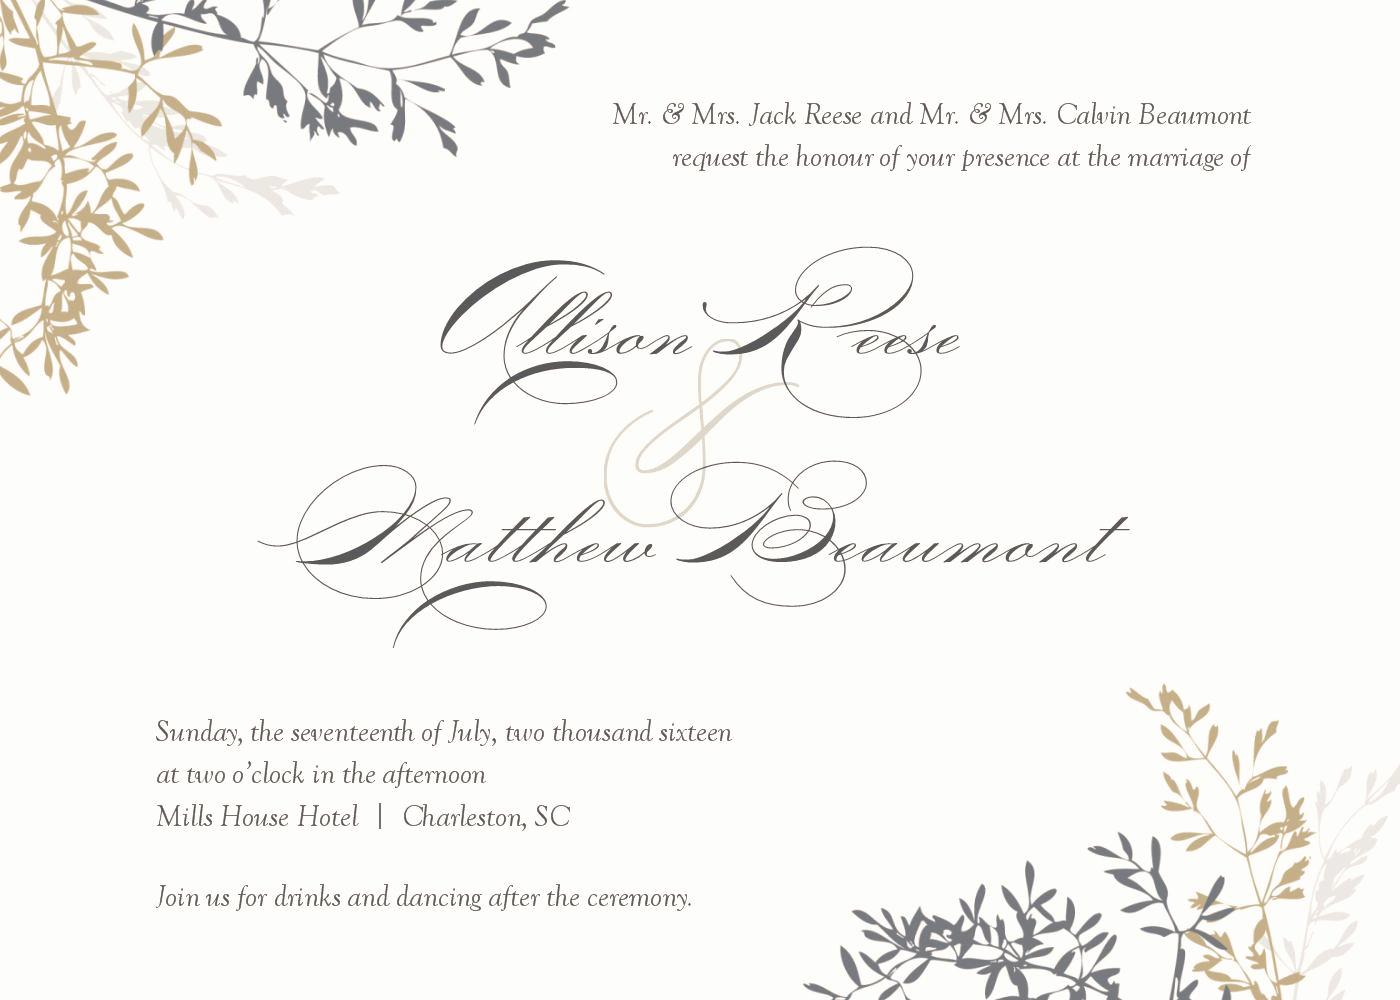 Wedding Invitation Design Templates Inspirational Wedding Invitation Wedding Invitations Template Superb